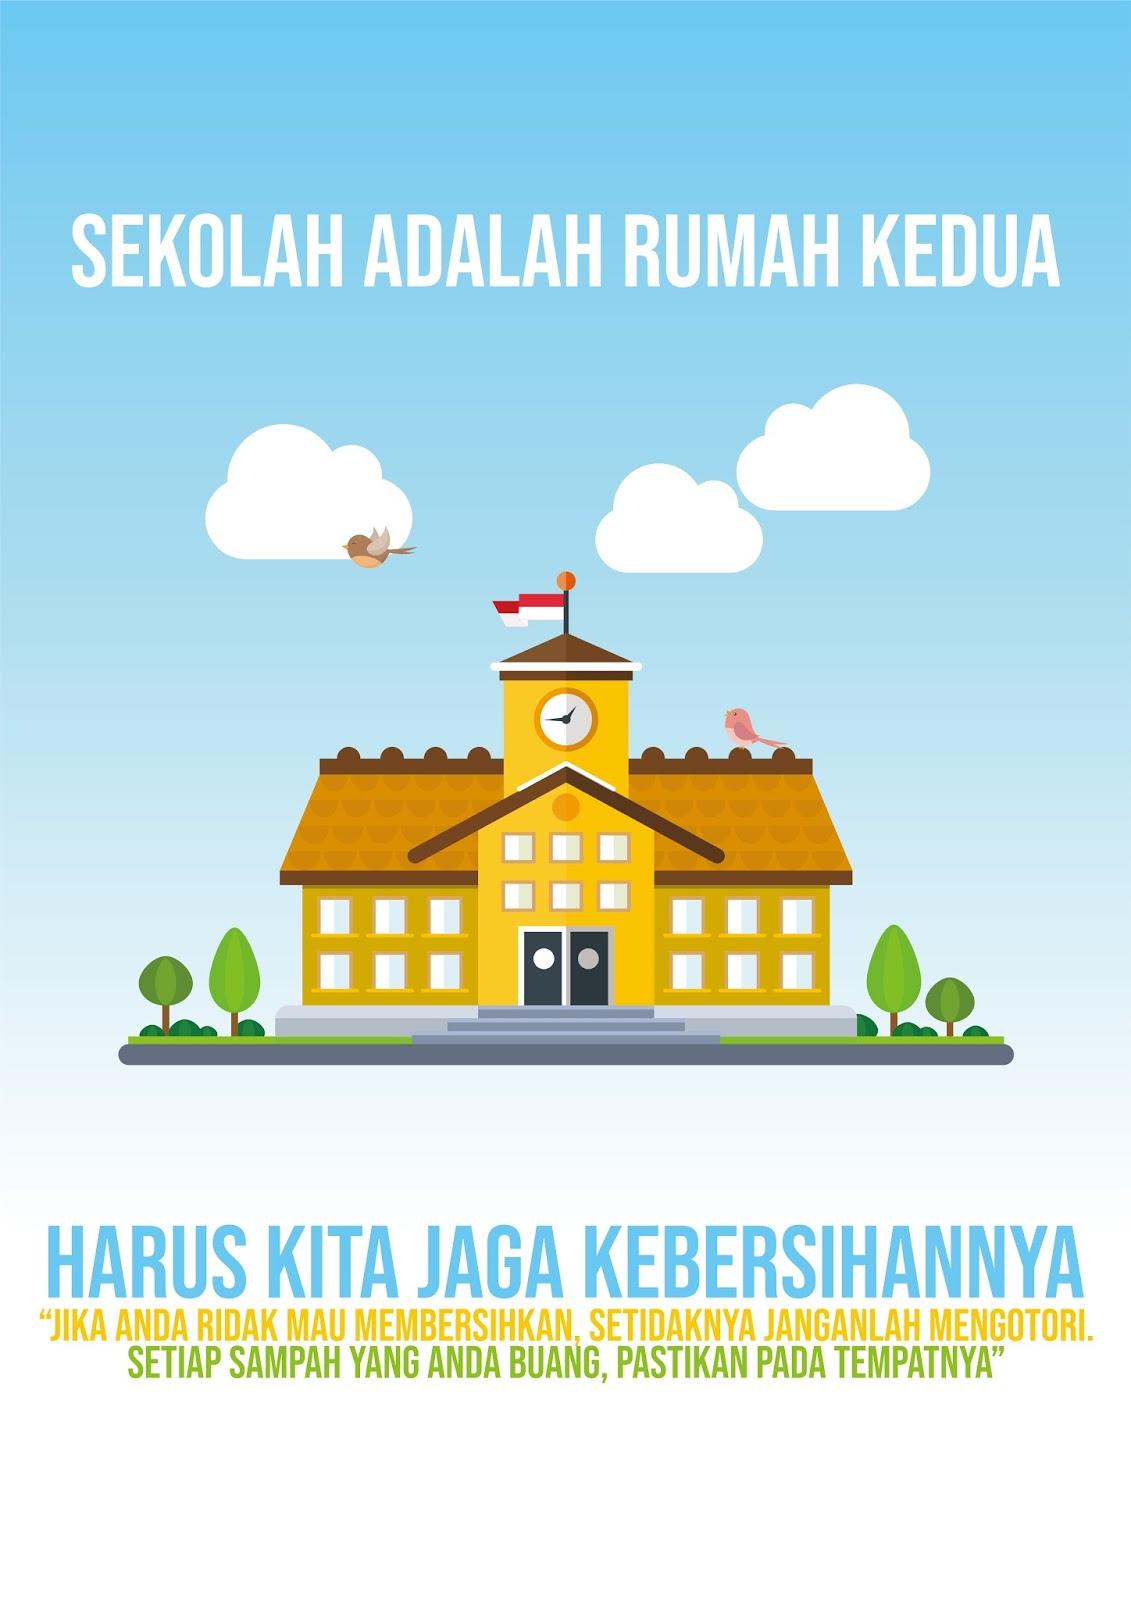 Poster Lingkungan Sekolah : poster, lingkungan, sekolah, Bagus, Untuk, Poster, Lingkungan, Sekolah